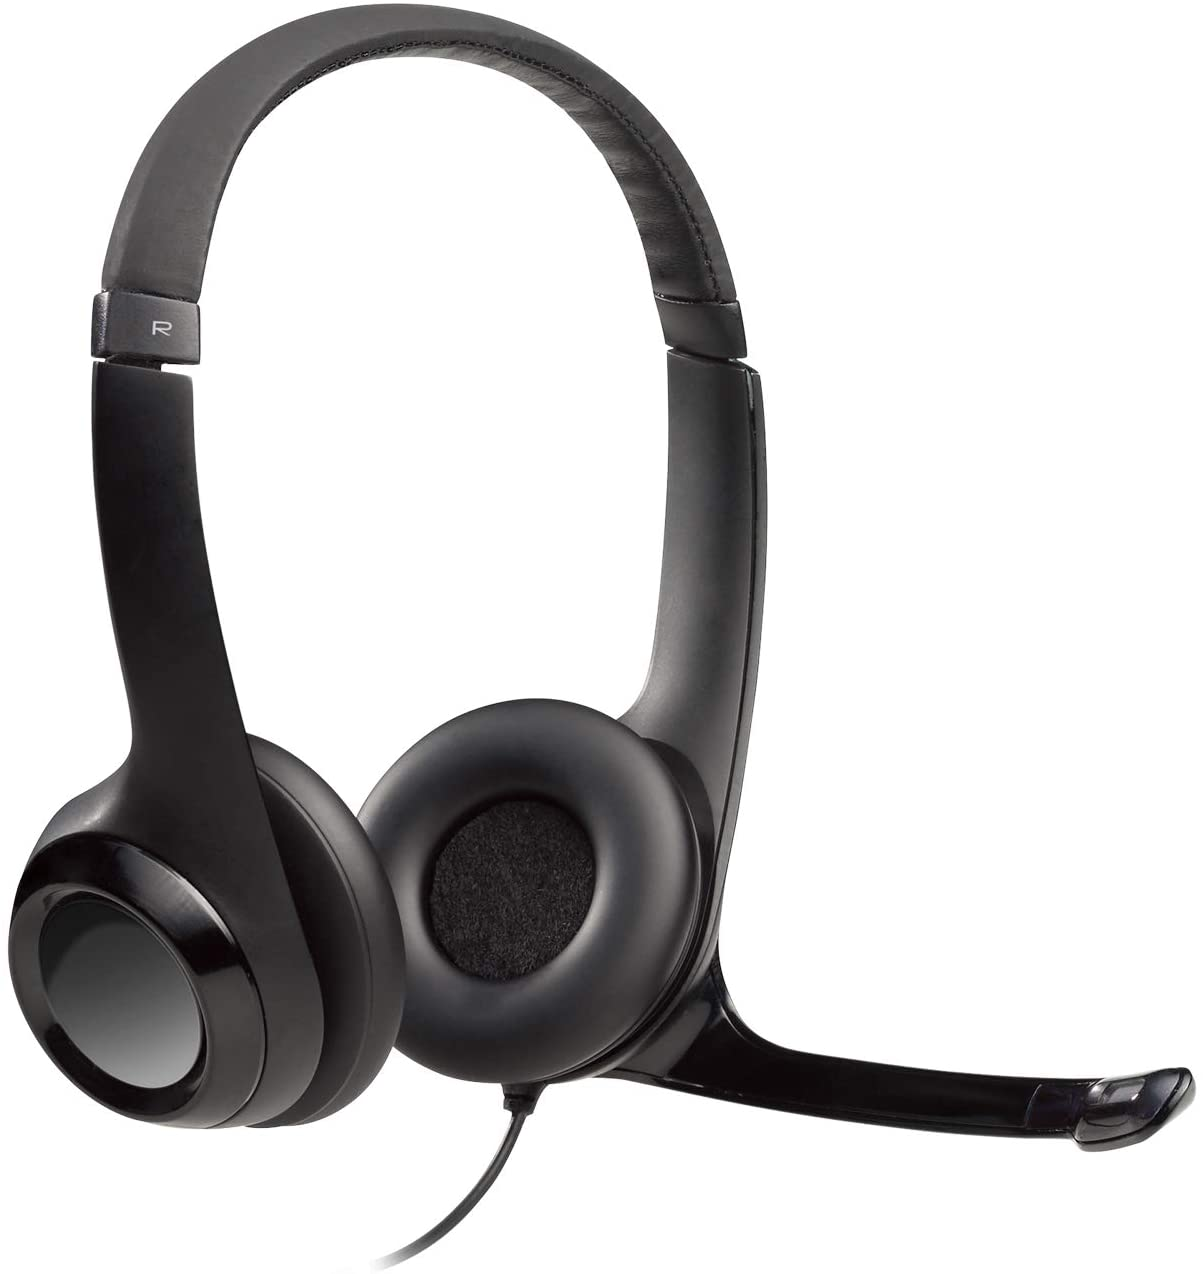 Headset Biauricular USB H390 com Áudio Digital - Logitech